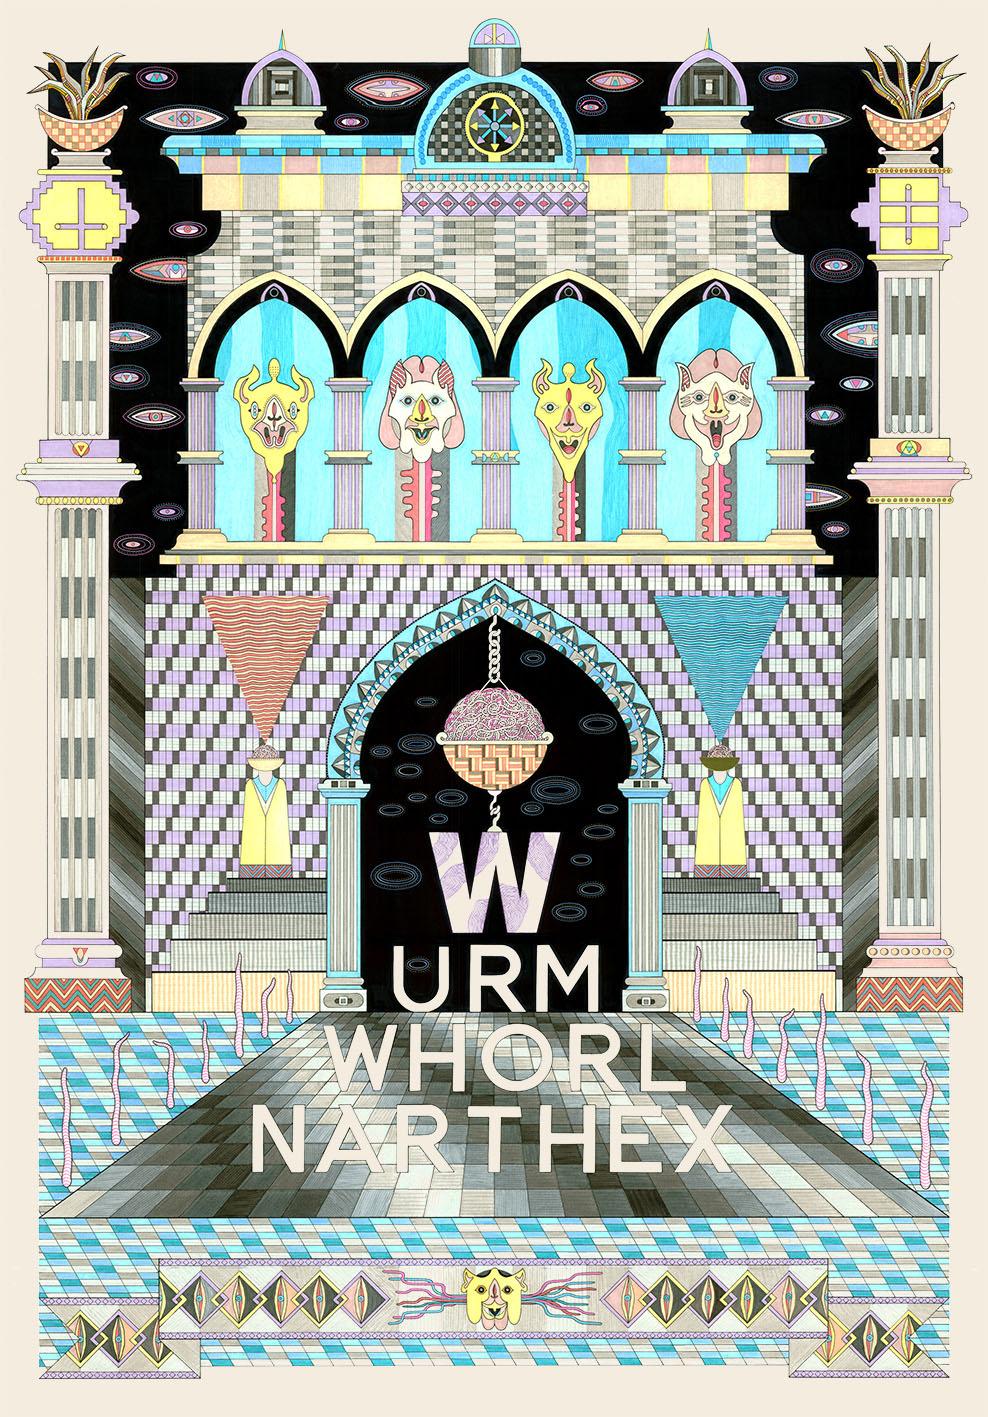 Wurm Whorl Narthex, 2013